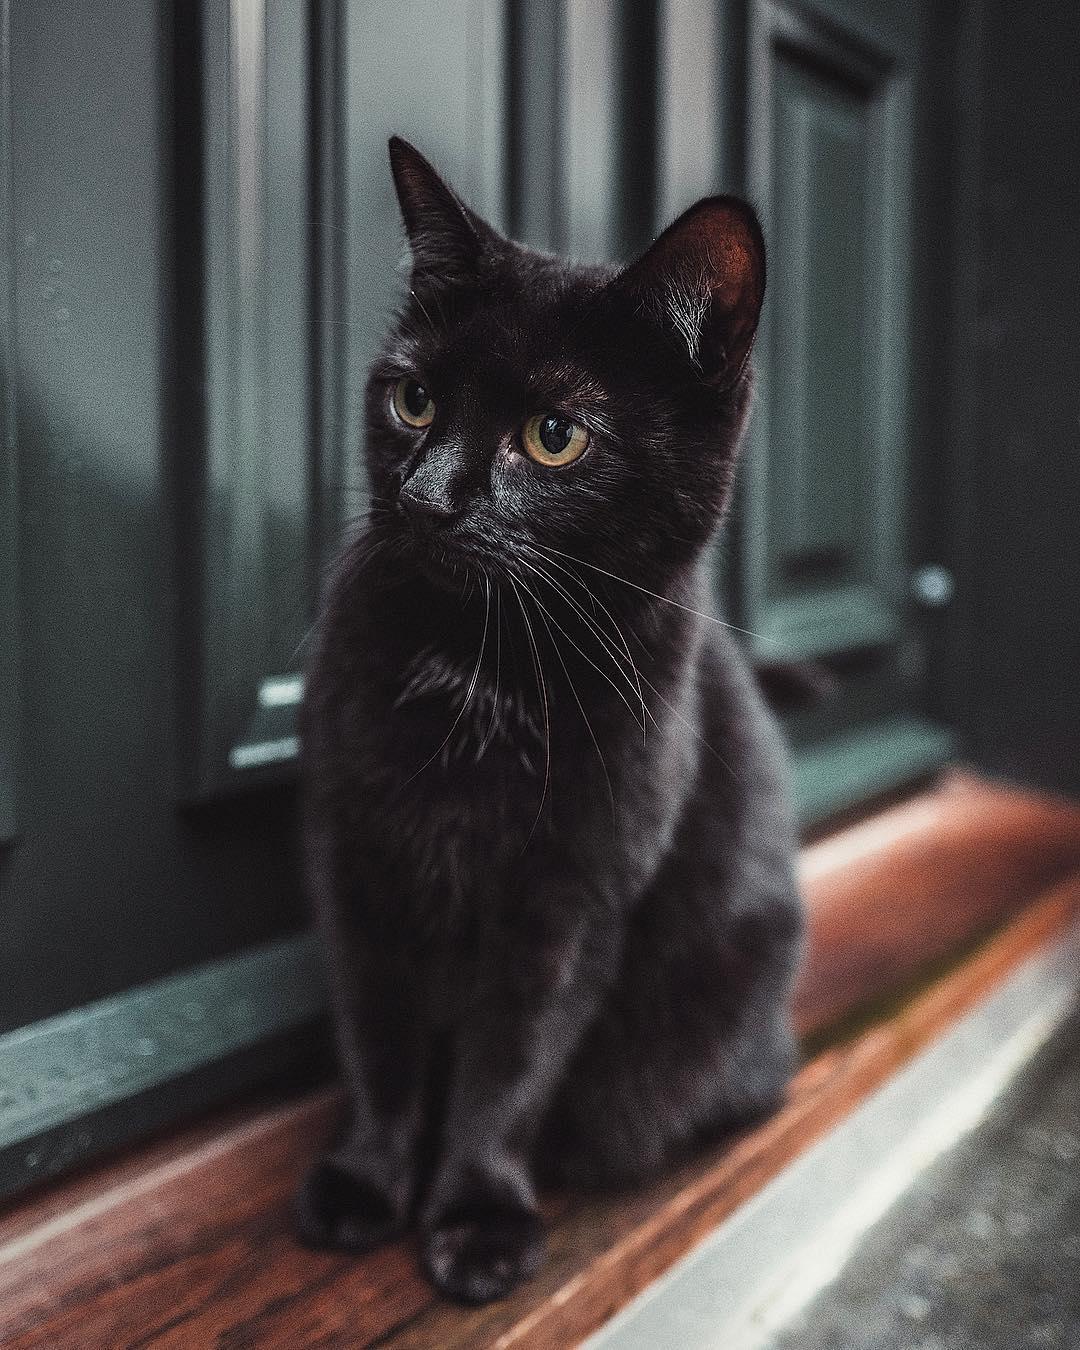 Фото Черная кошечка сидит на пороге дома, by eirikbjo